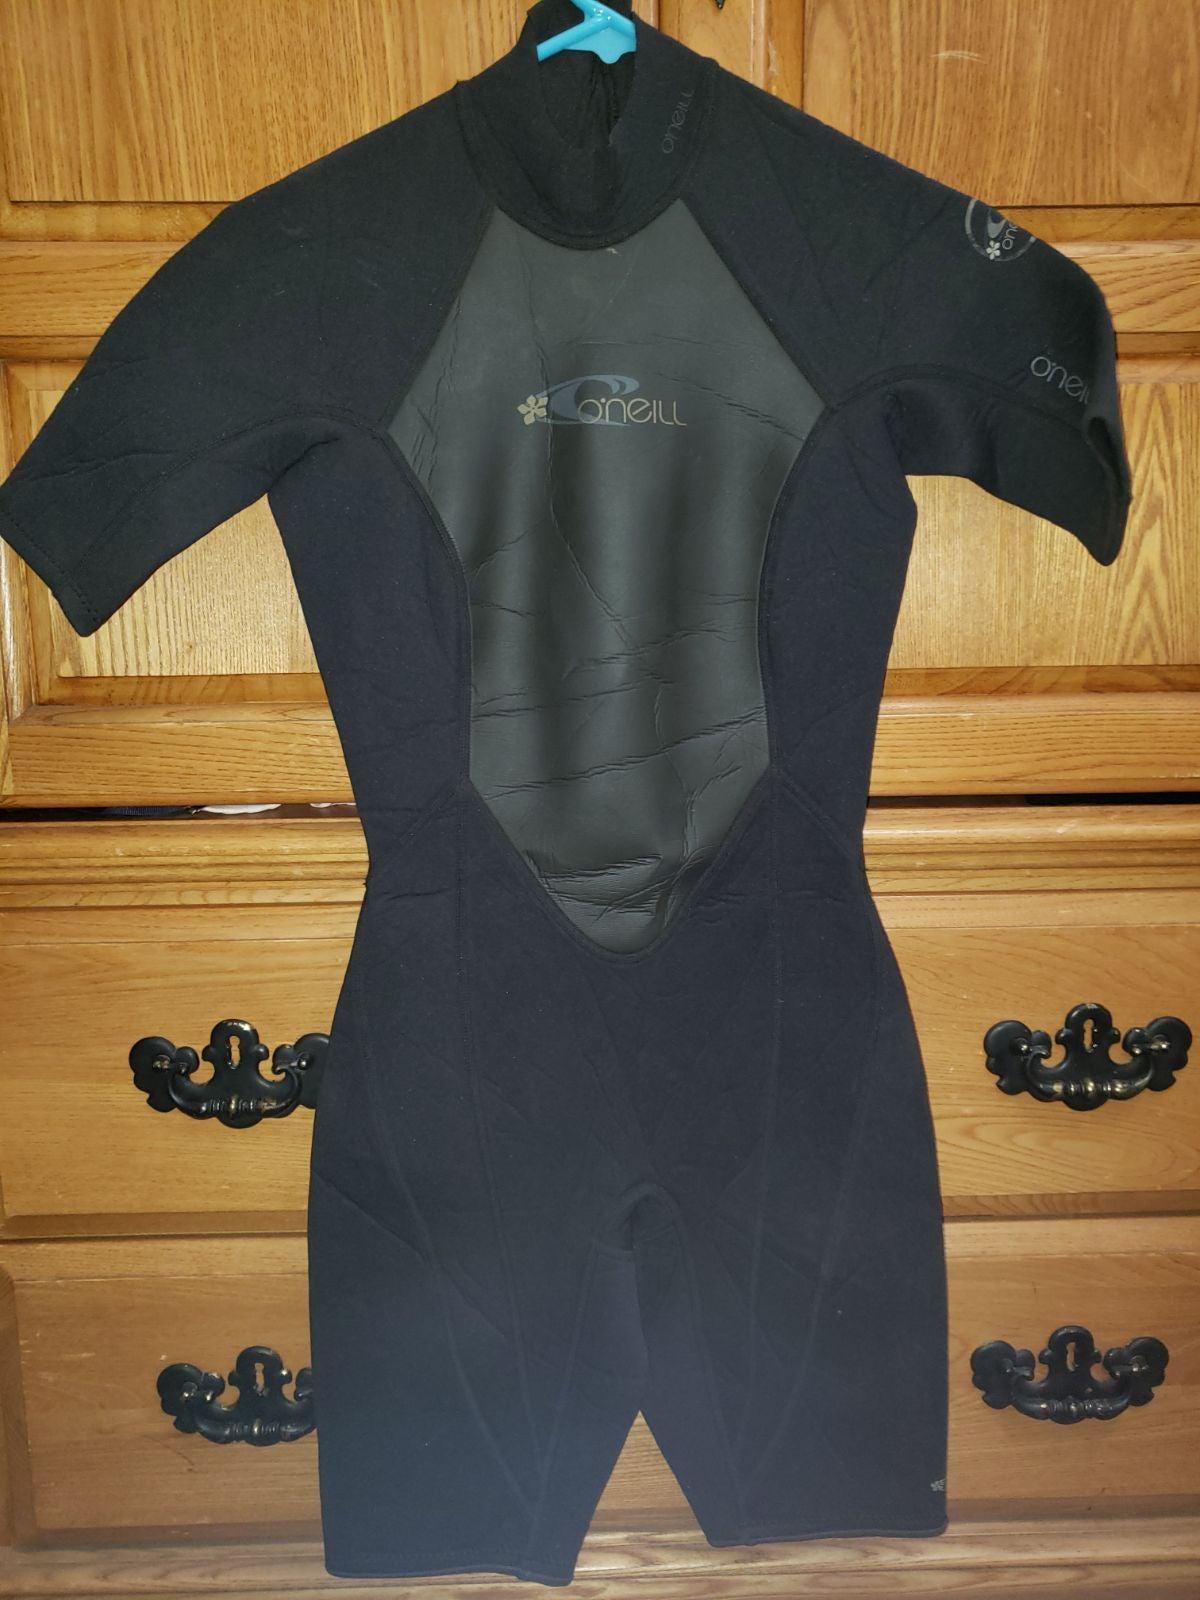 O'neill Reactor spring suit